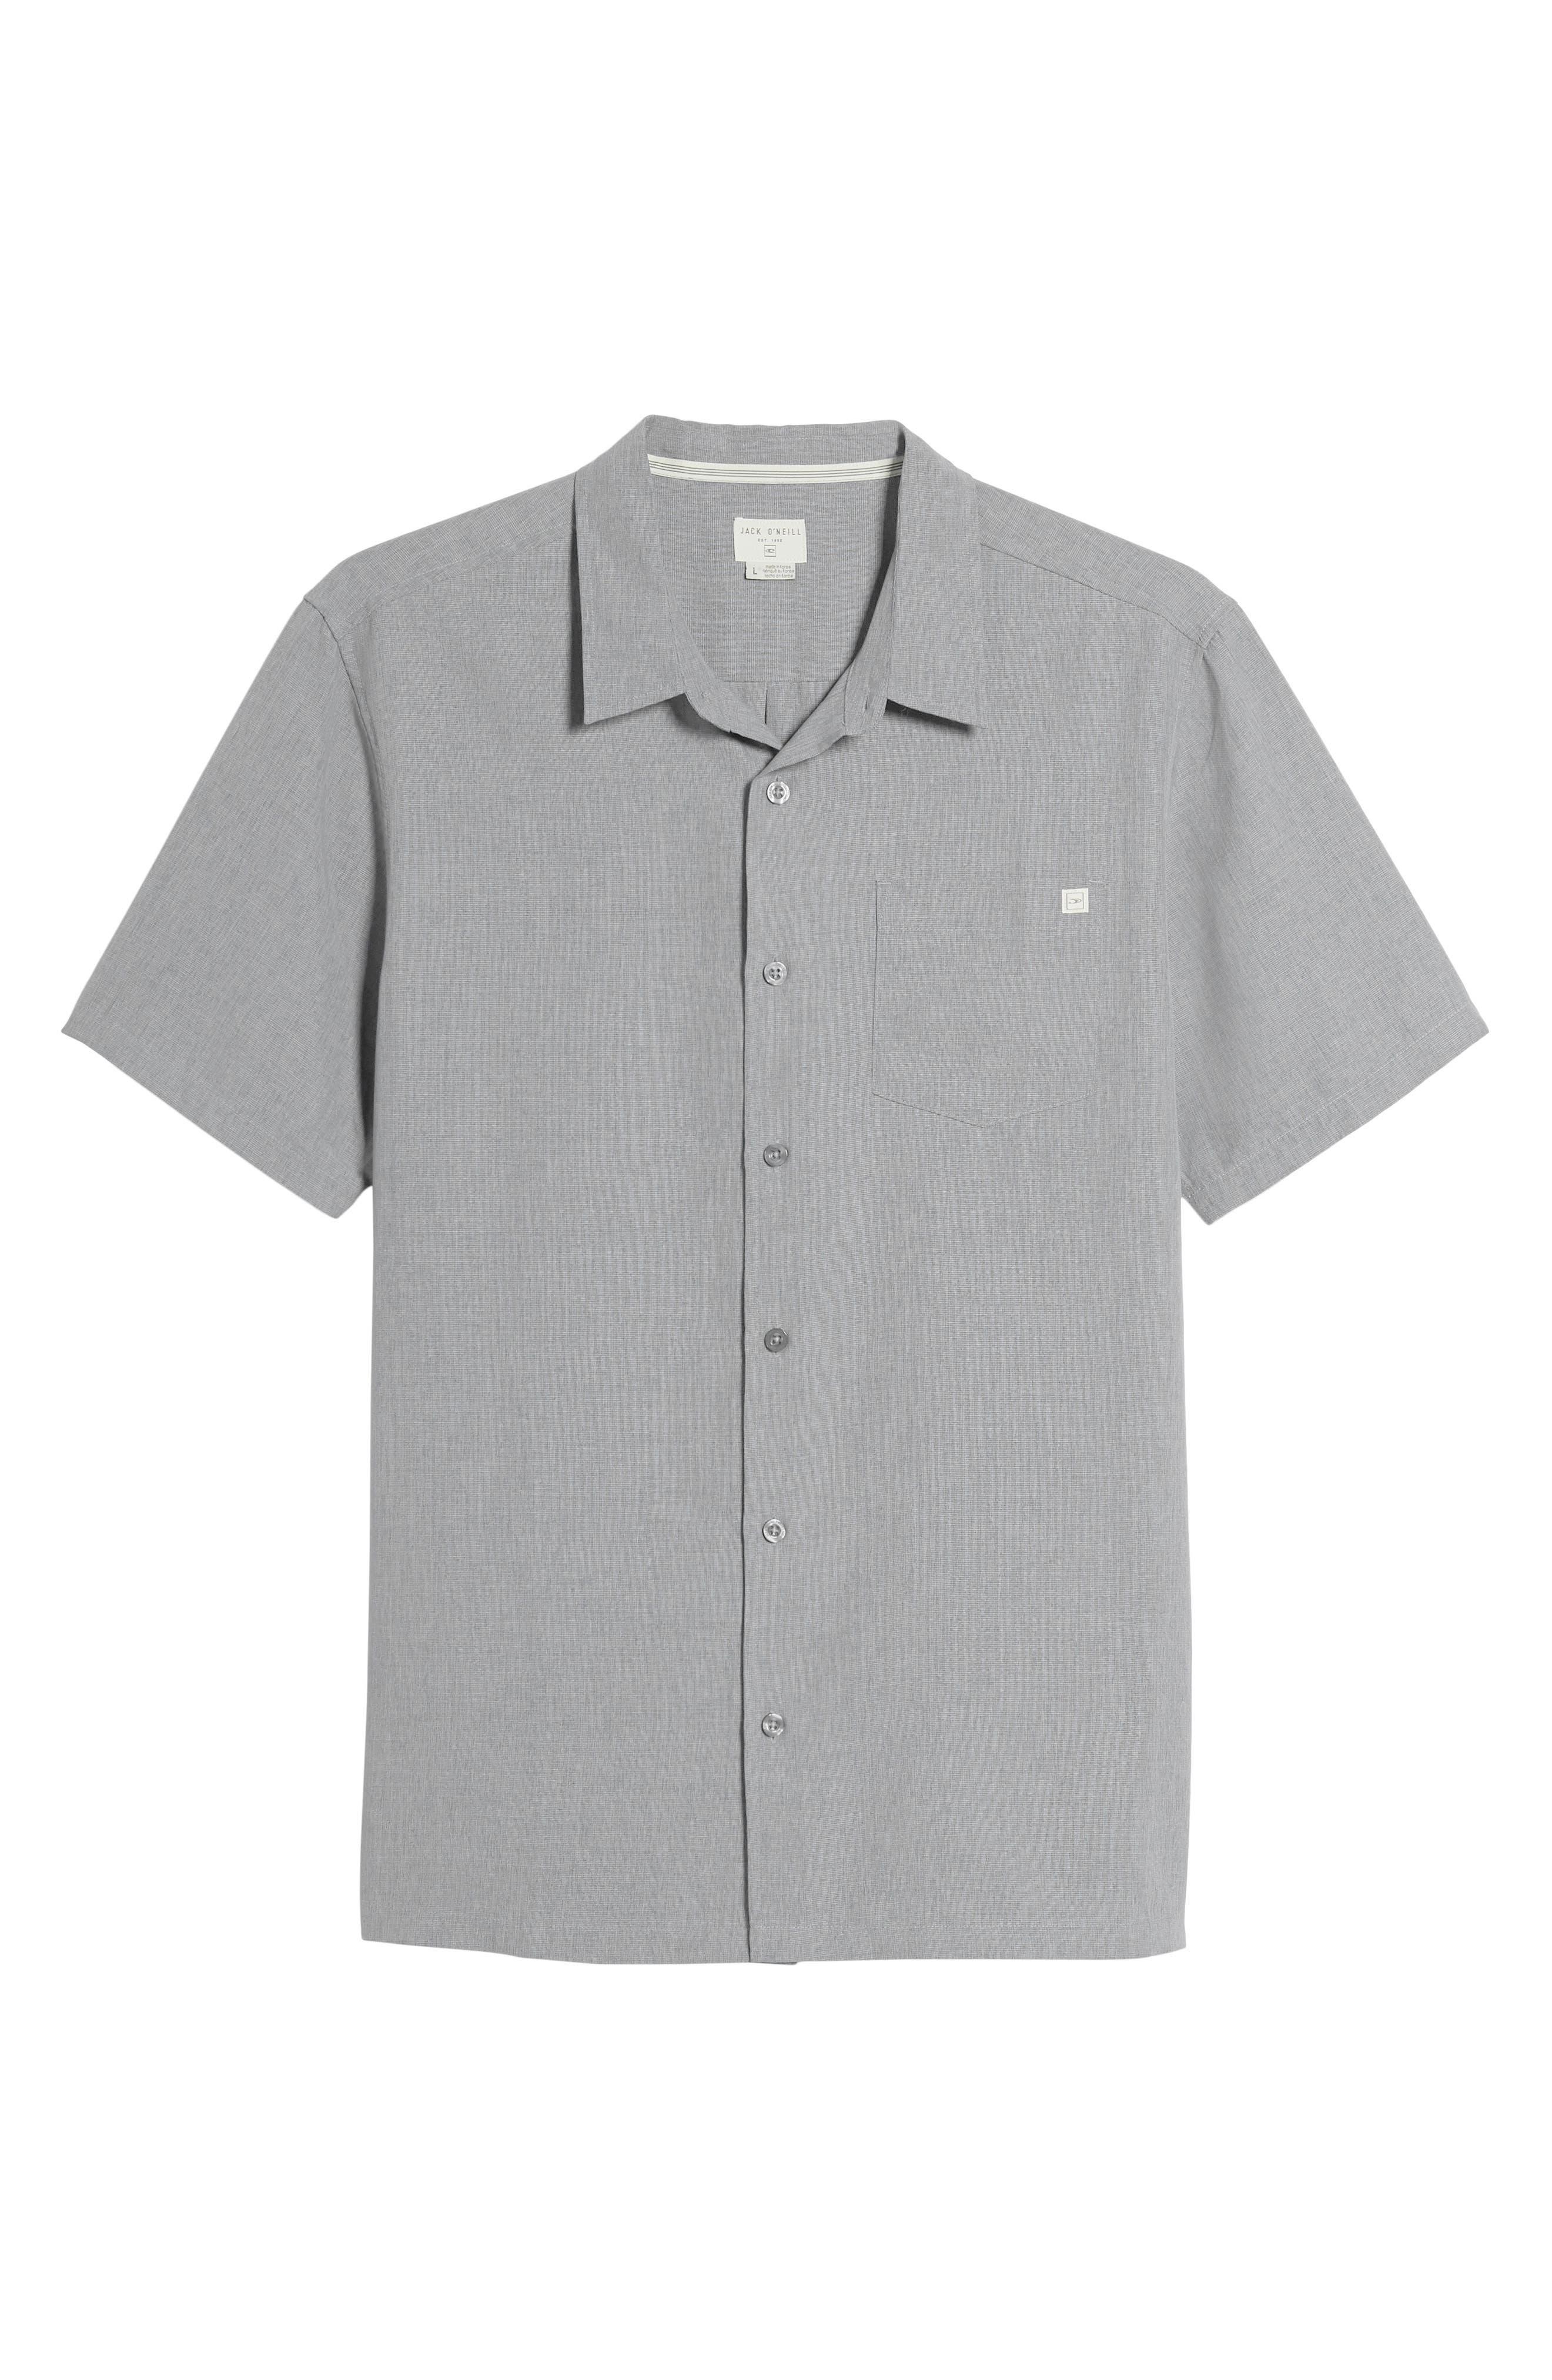 Liberty Regular Fit Short Sleeve Sport Shirt,                             Alternate thumbnail 11, color,                             Light Grey